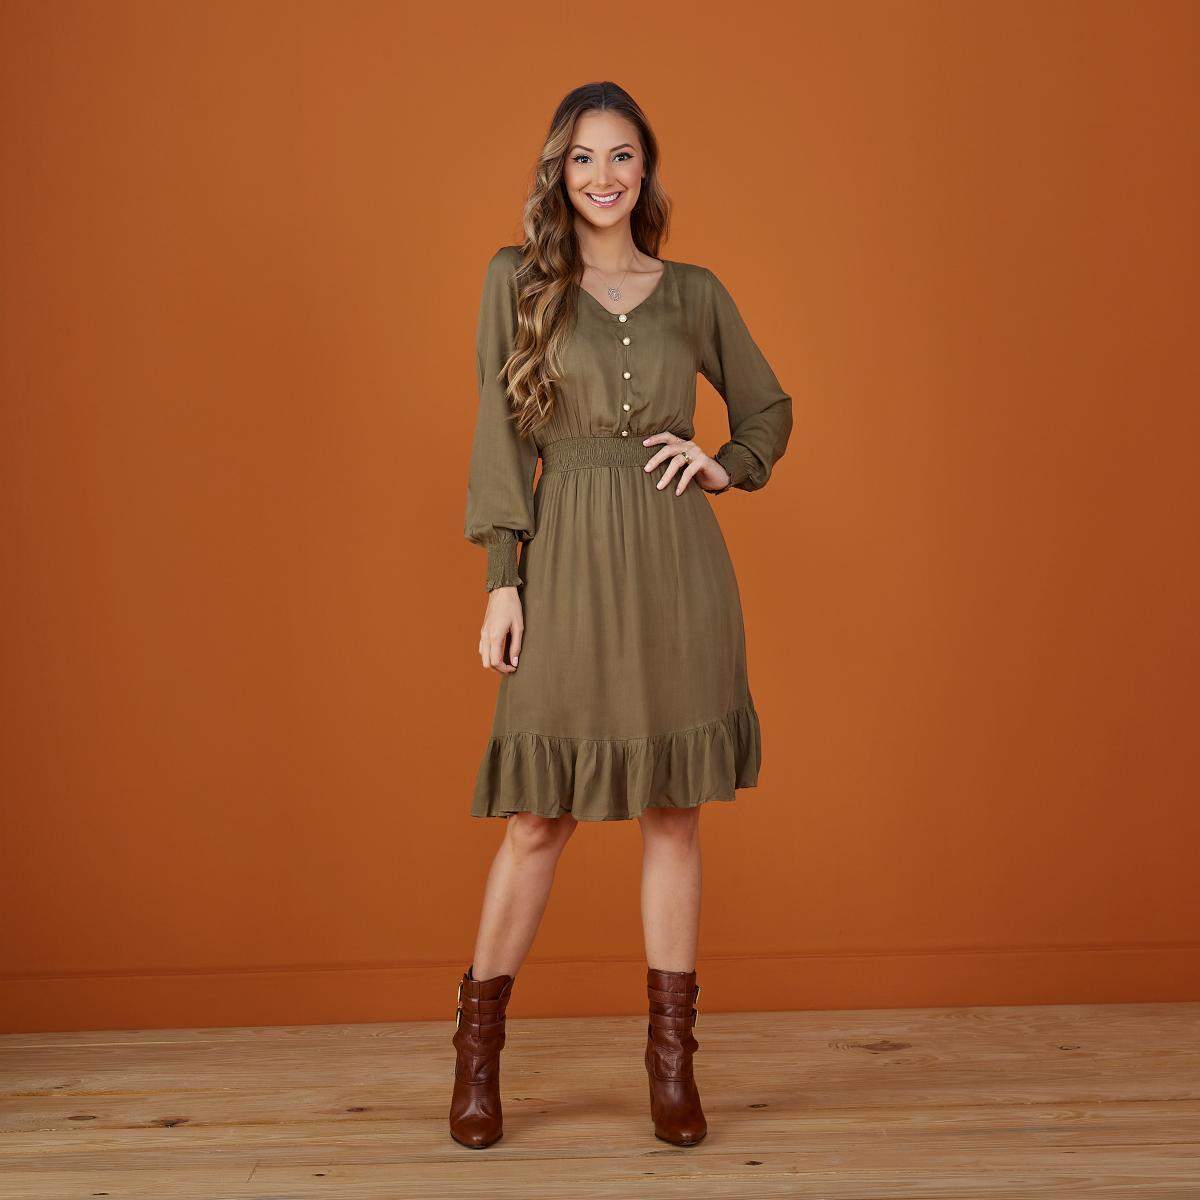 Vestido Fabiana Lastex na Cintura, Moda Evangélica - Tatá Martello